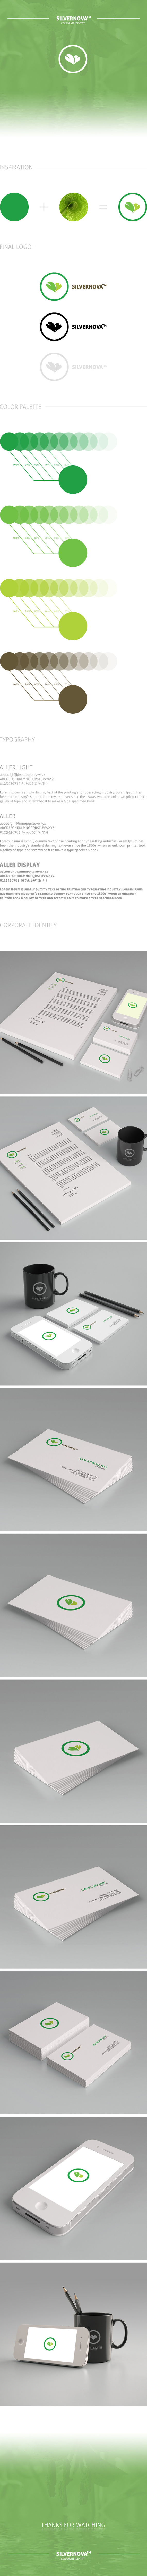 SILVERNOVA #design #corporate #identity #ci #logo